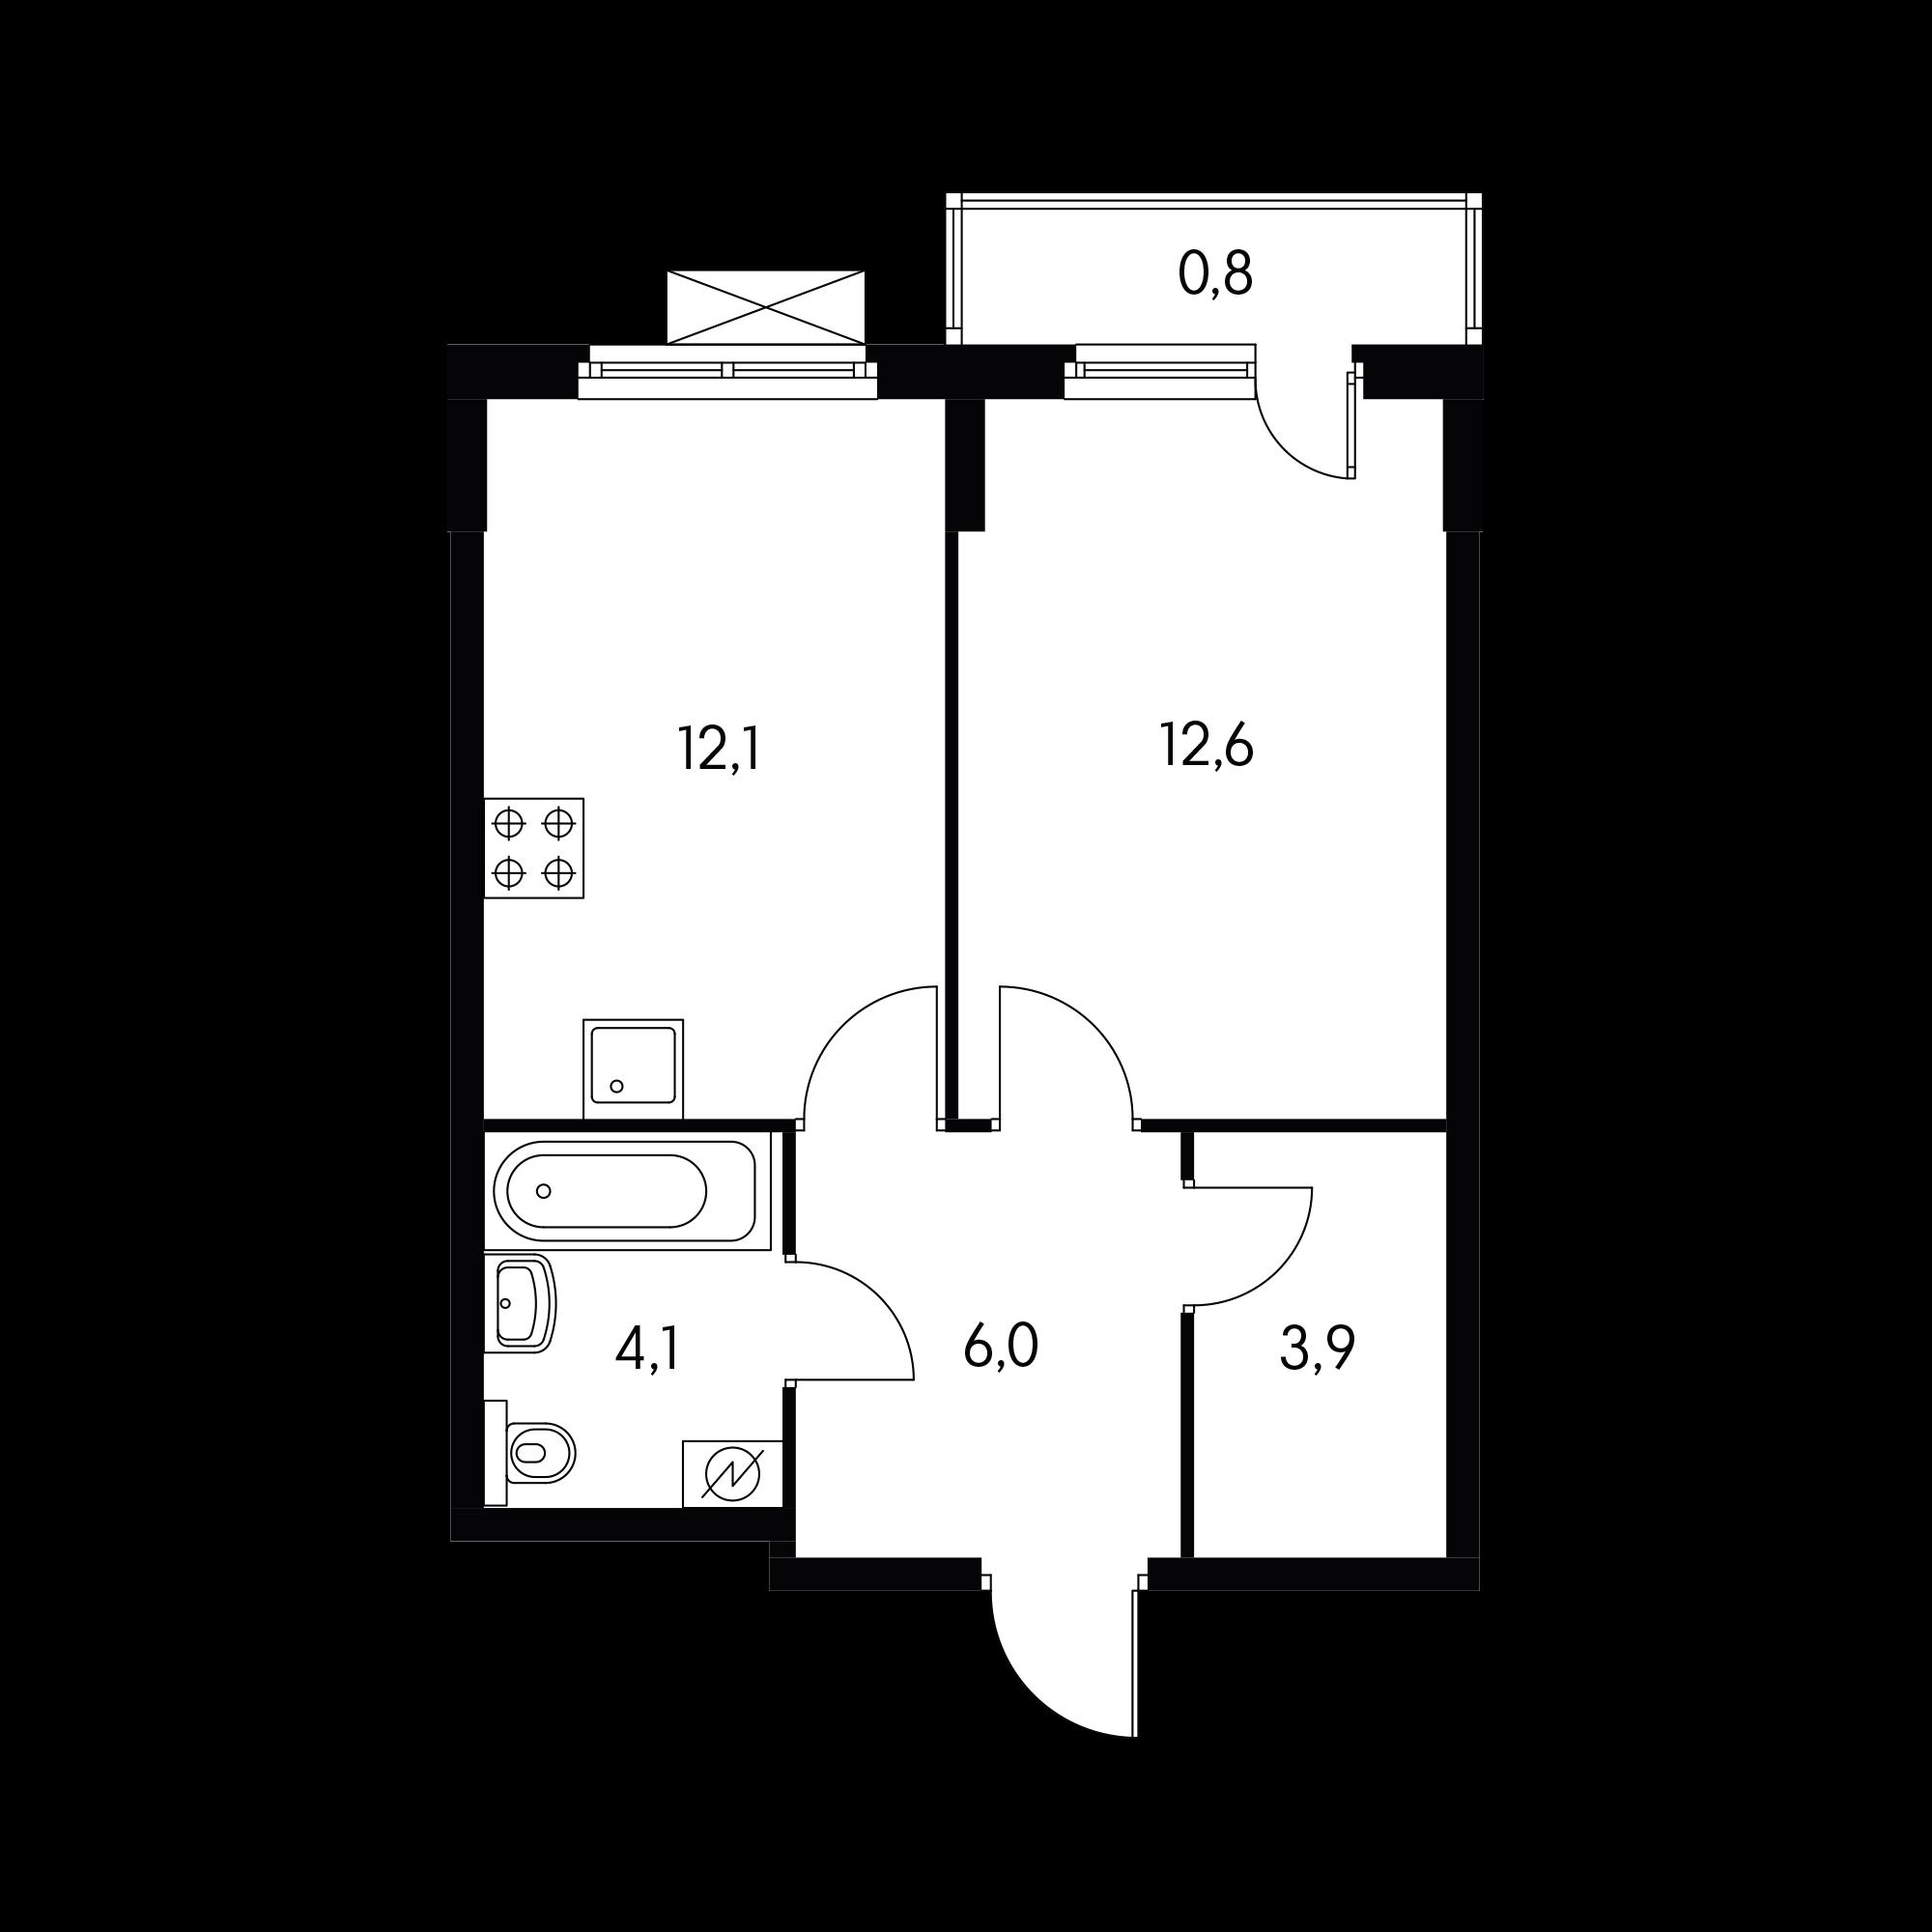 1-1_7